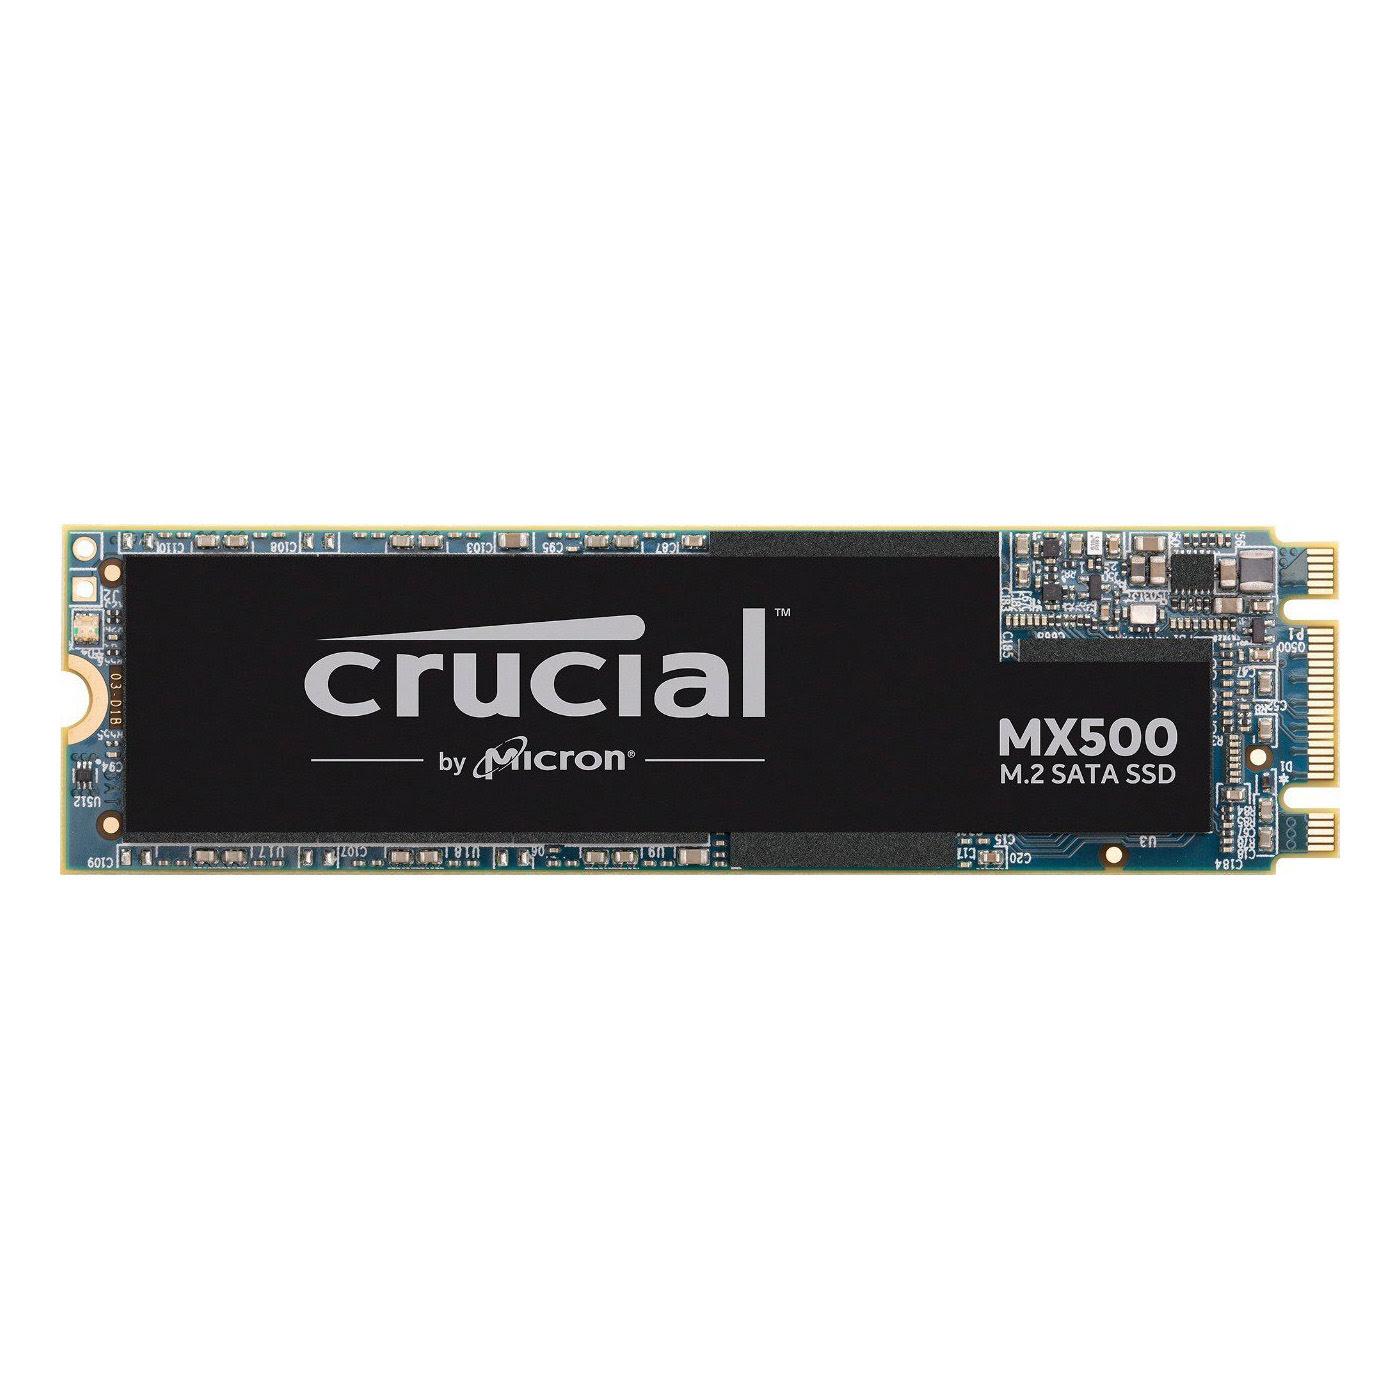 Crucial MX500 240-275Go - Disque SSD Crucial - Cybertek.fr - 0